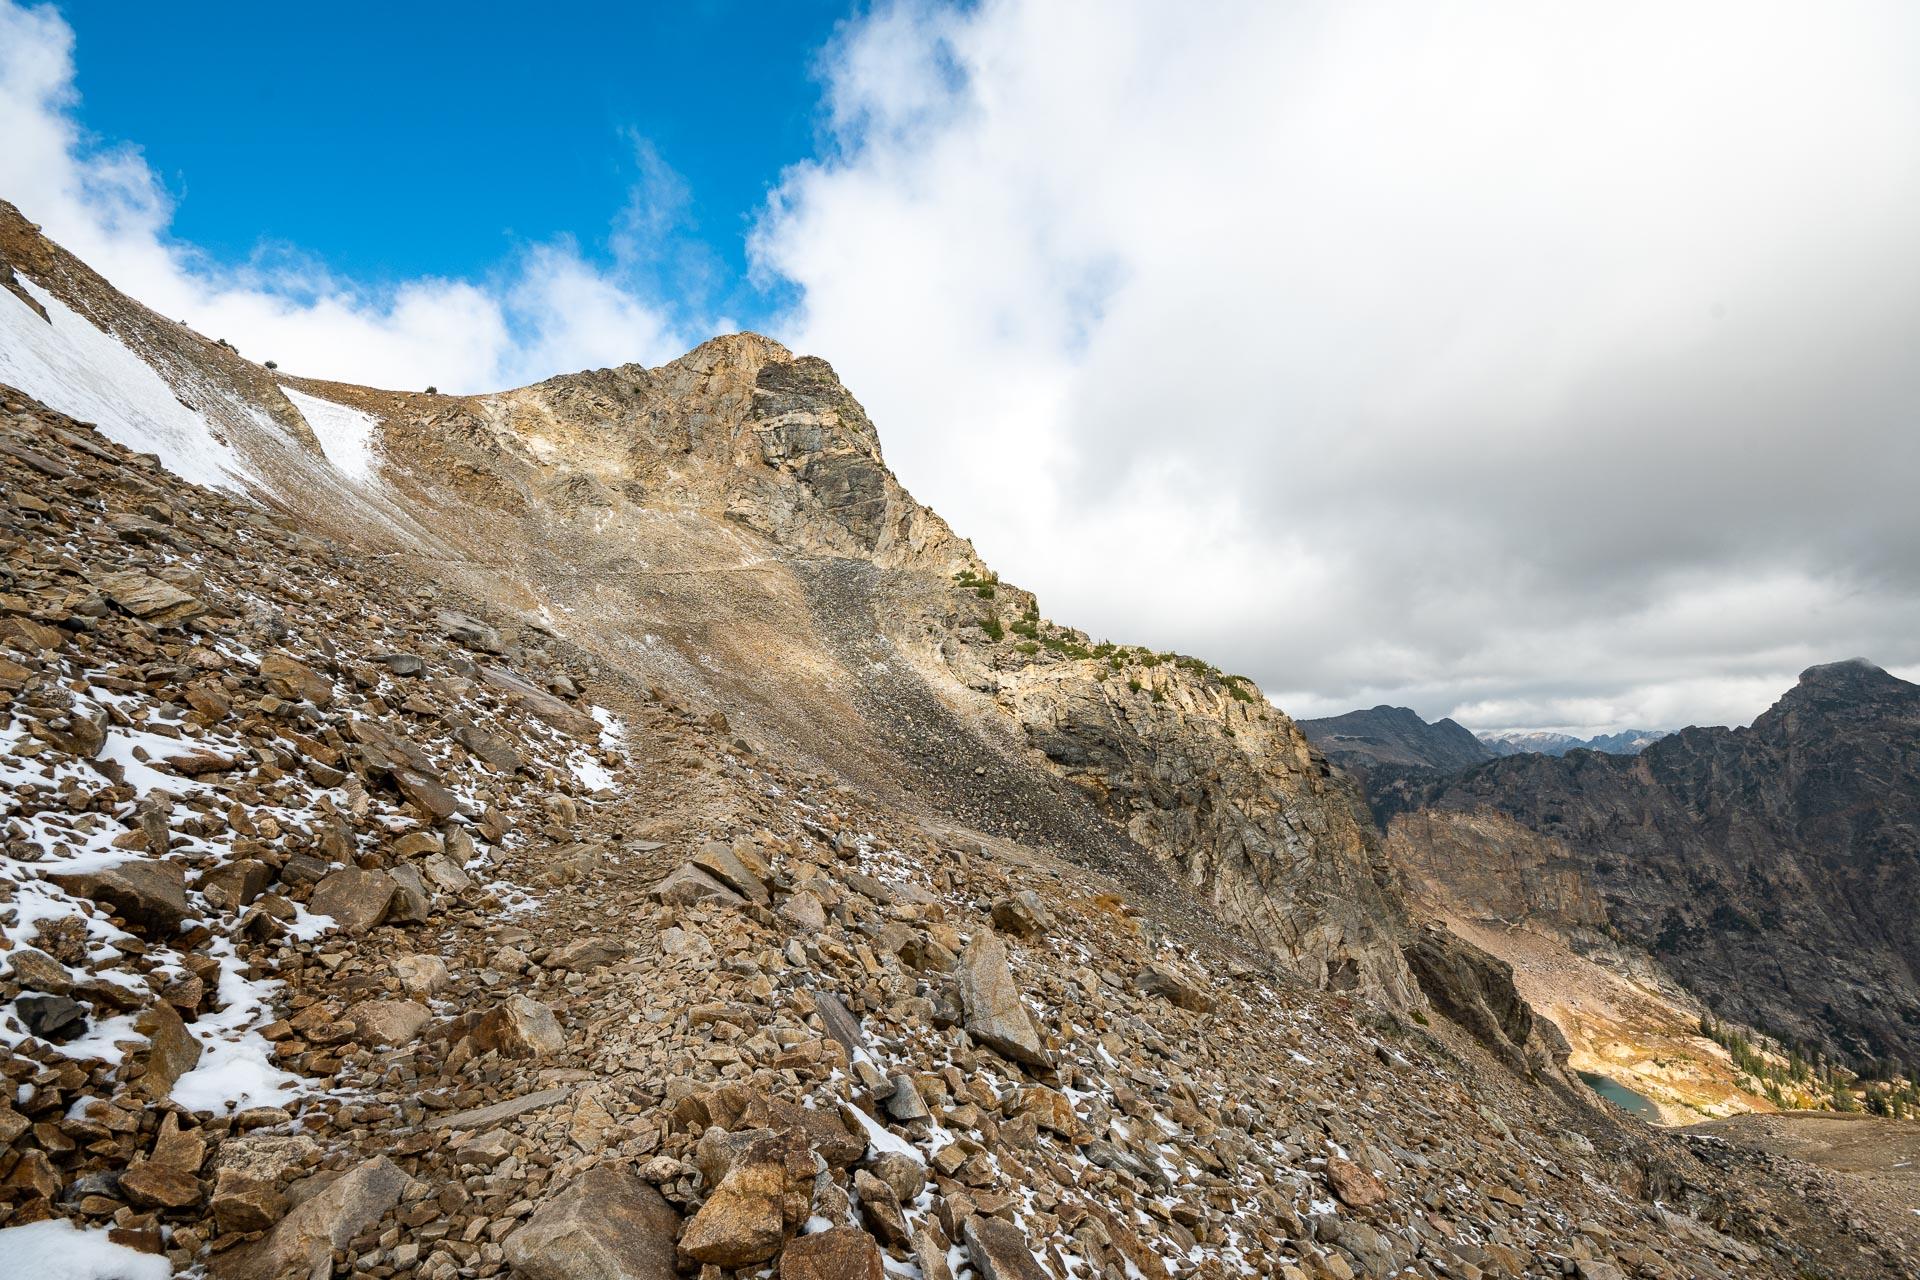 Trail ascending to Paintbrush Divide